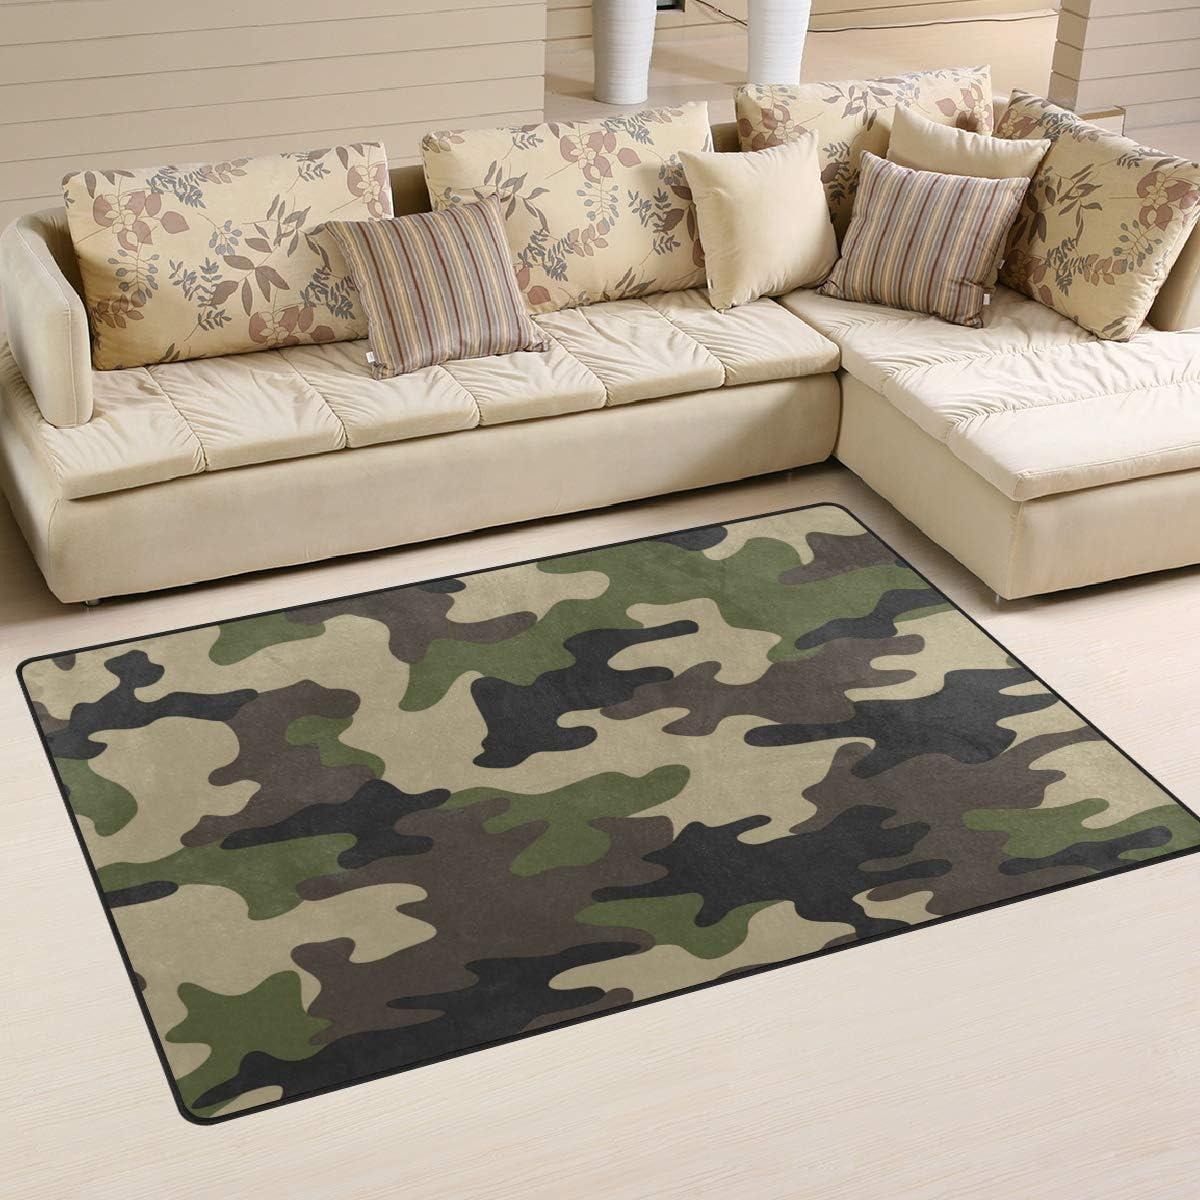 Linomo Area Rug Camouflage Green Camo Floor Rugs Doormat Living Room Home Decor, Carpets Area Mats for Kids Boys Girls Bedroom 60 x 39 Inches